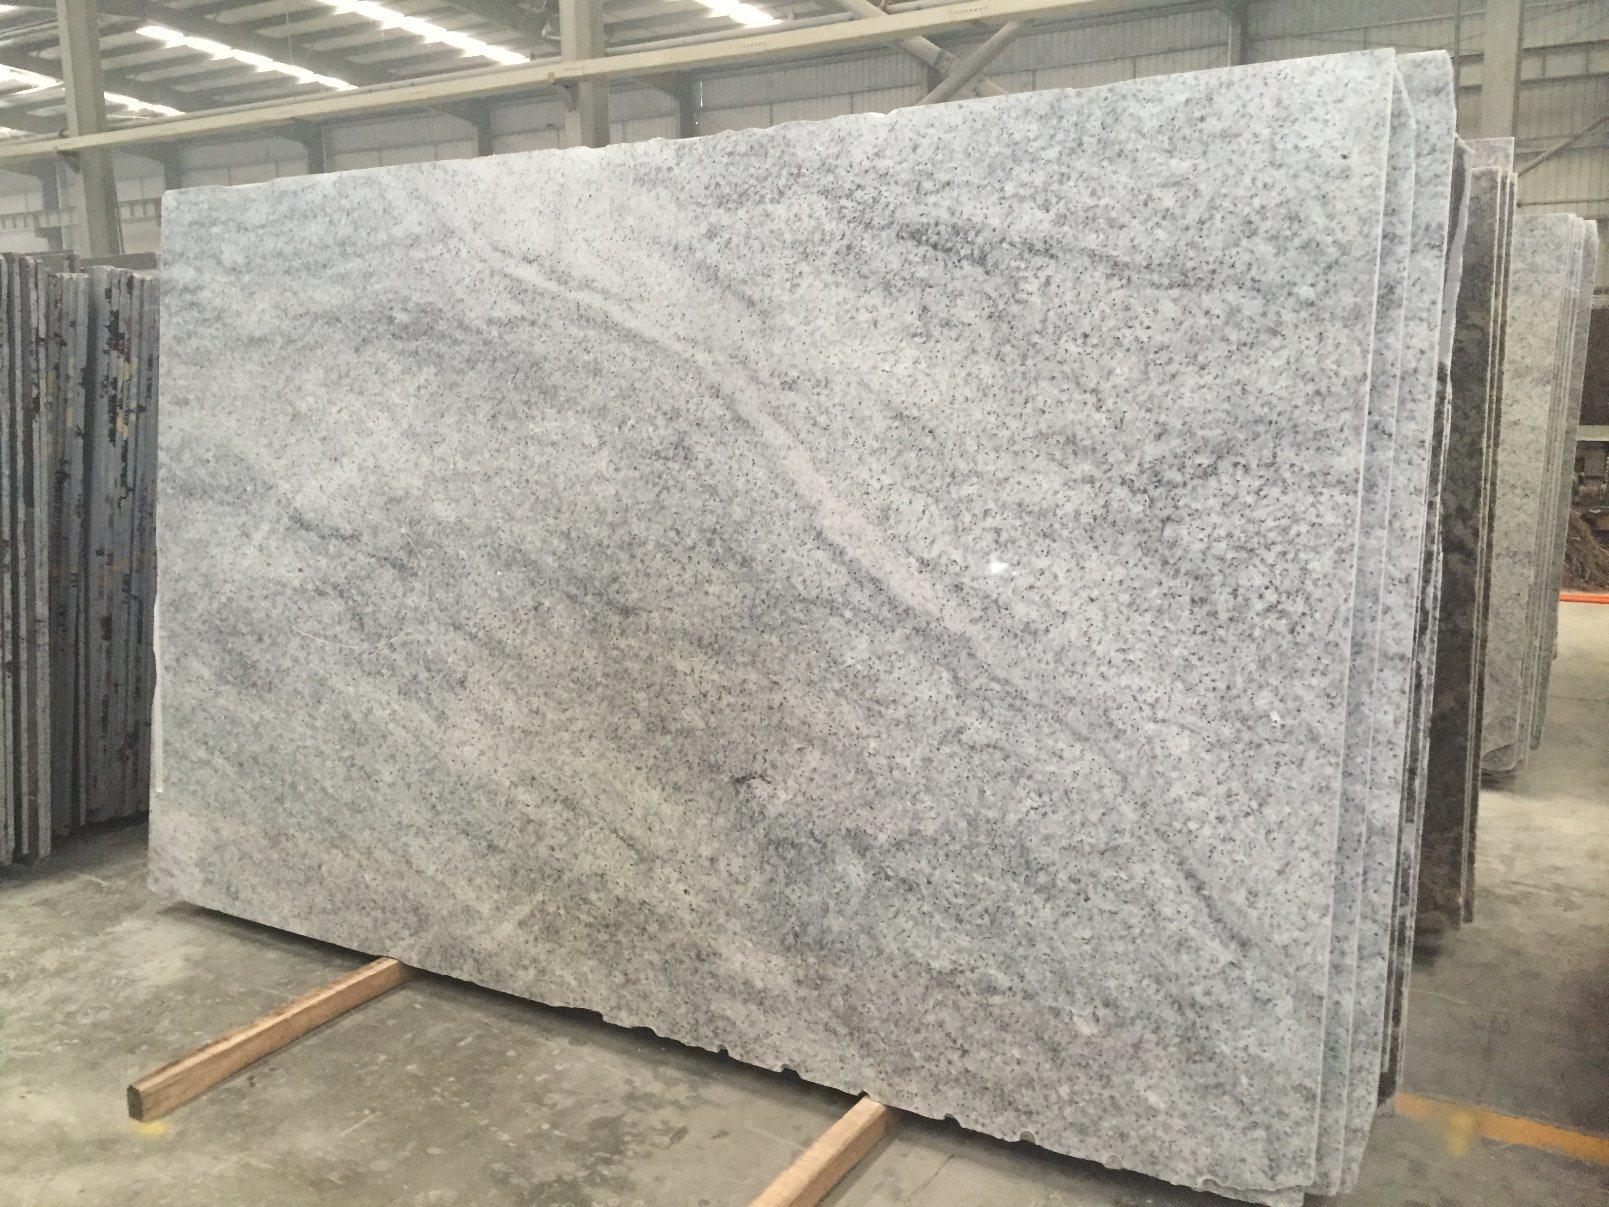 China Natural Stone Floor Wall Tiles Swan White Granite China Polished Surface Honed Surface